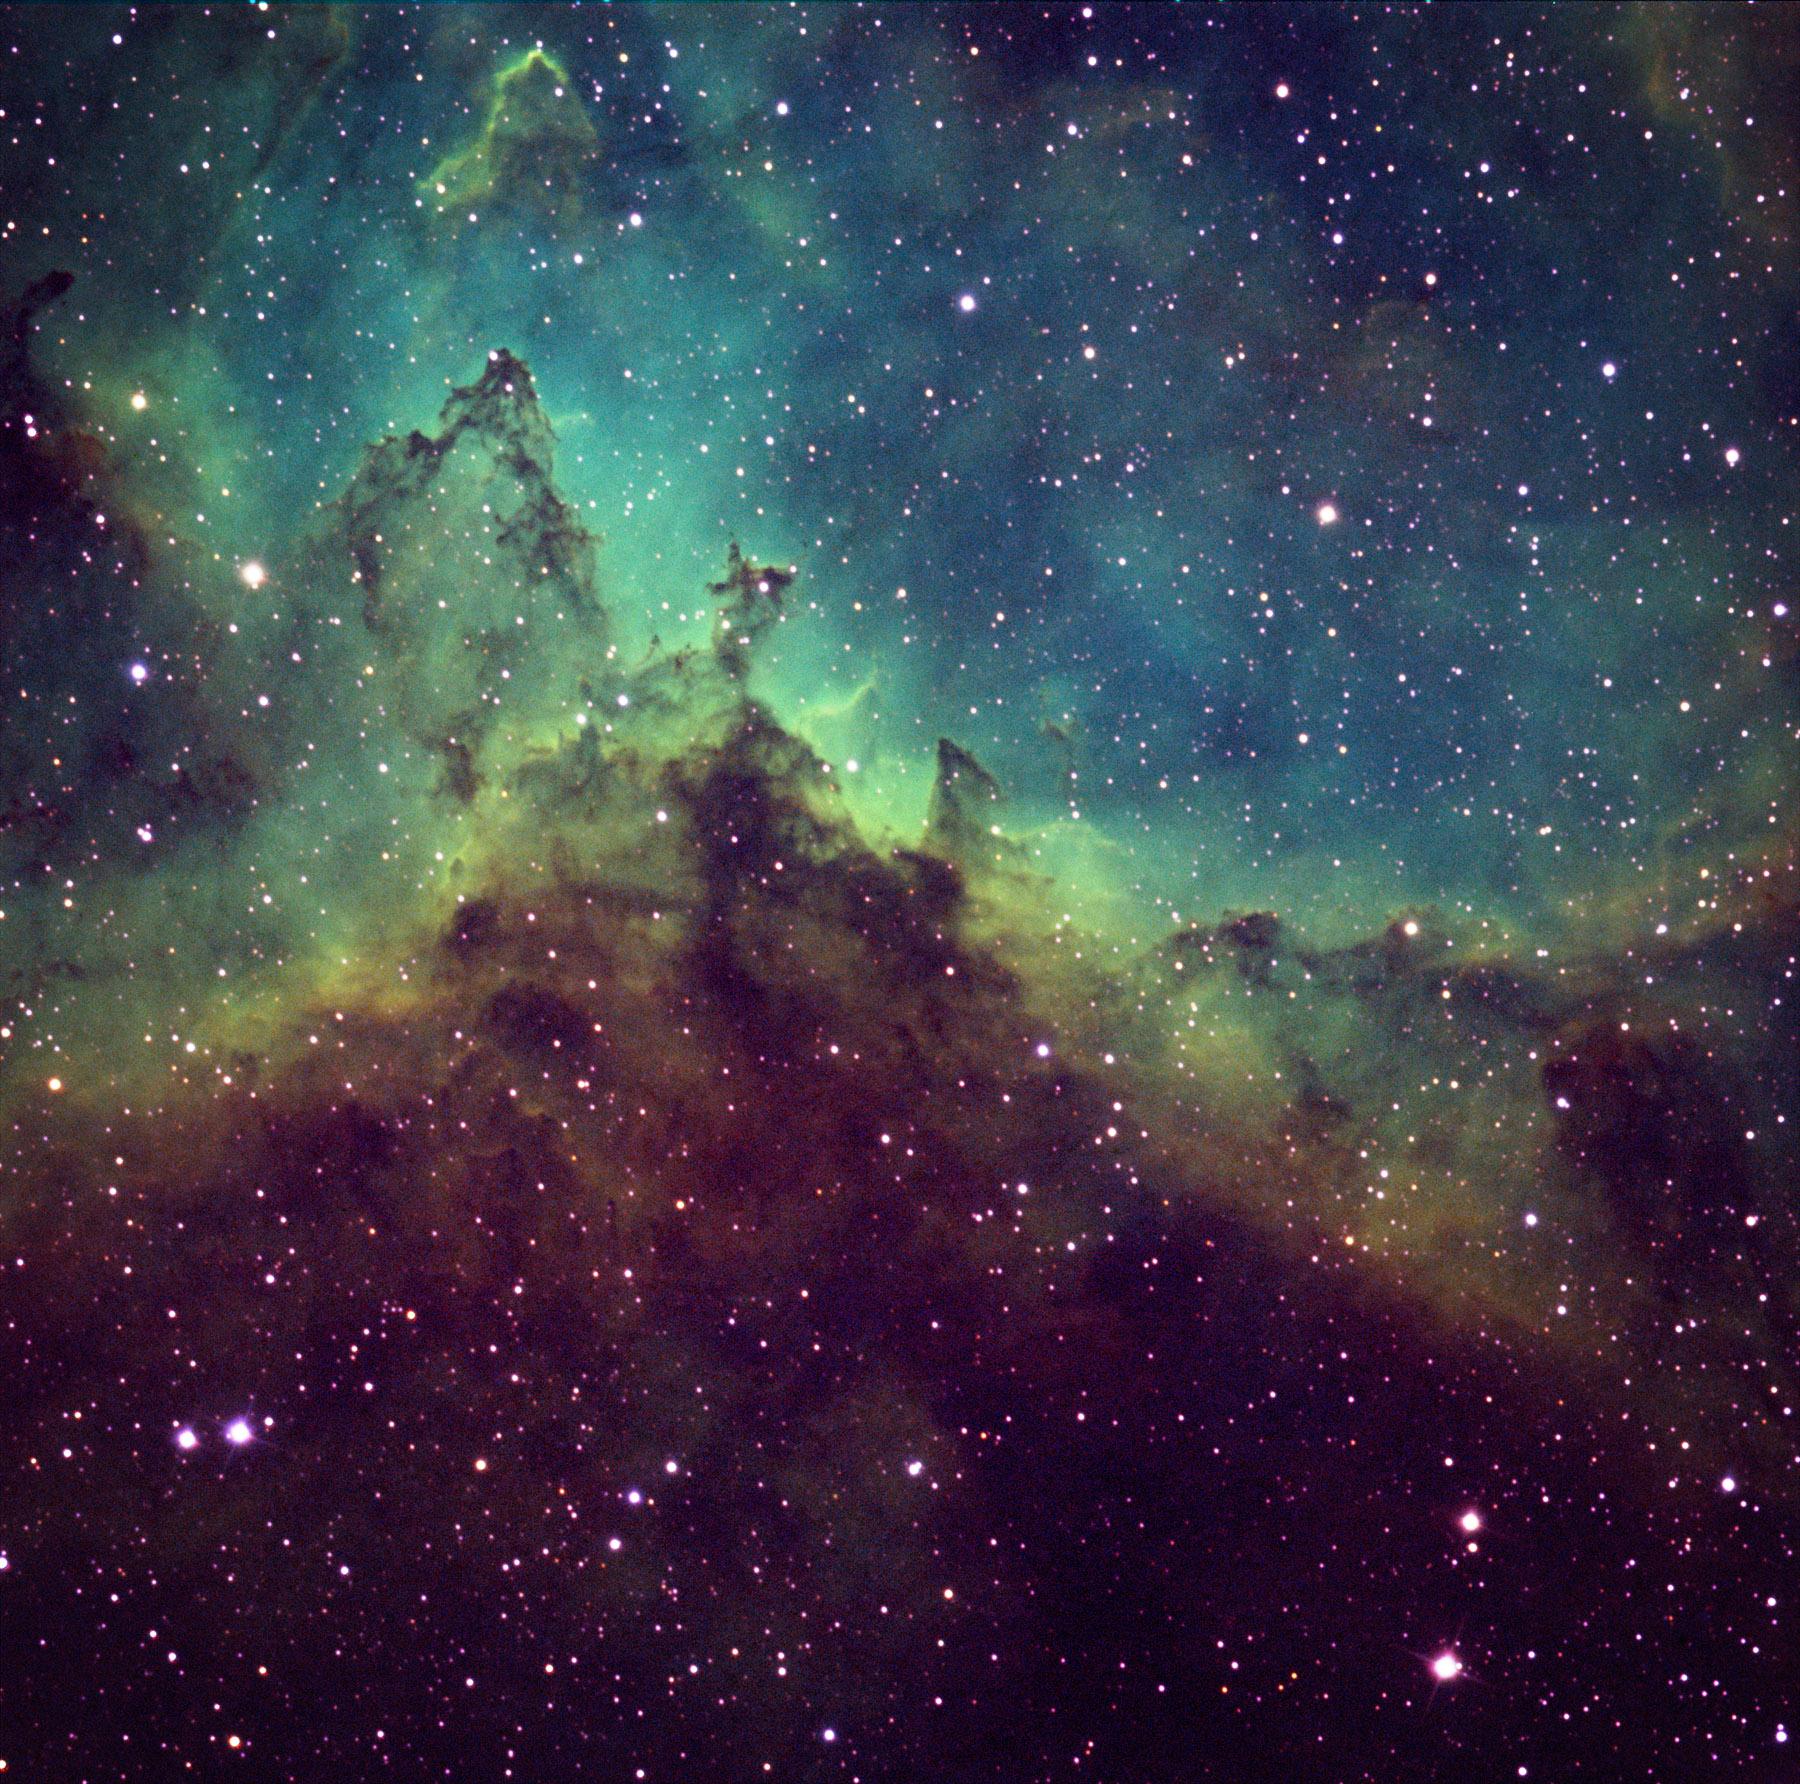 Nebula - Mike's Astro Photos